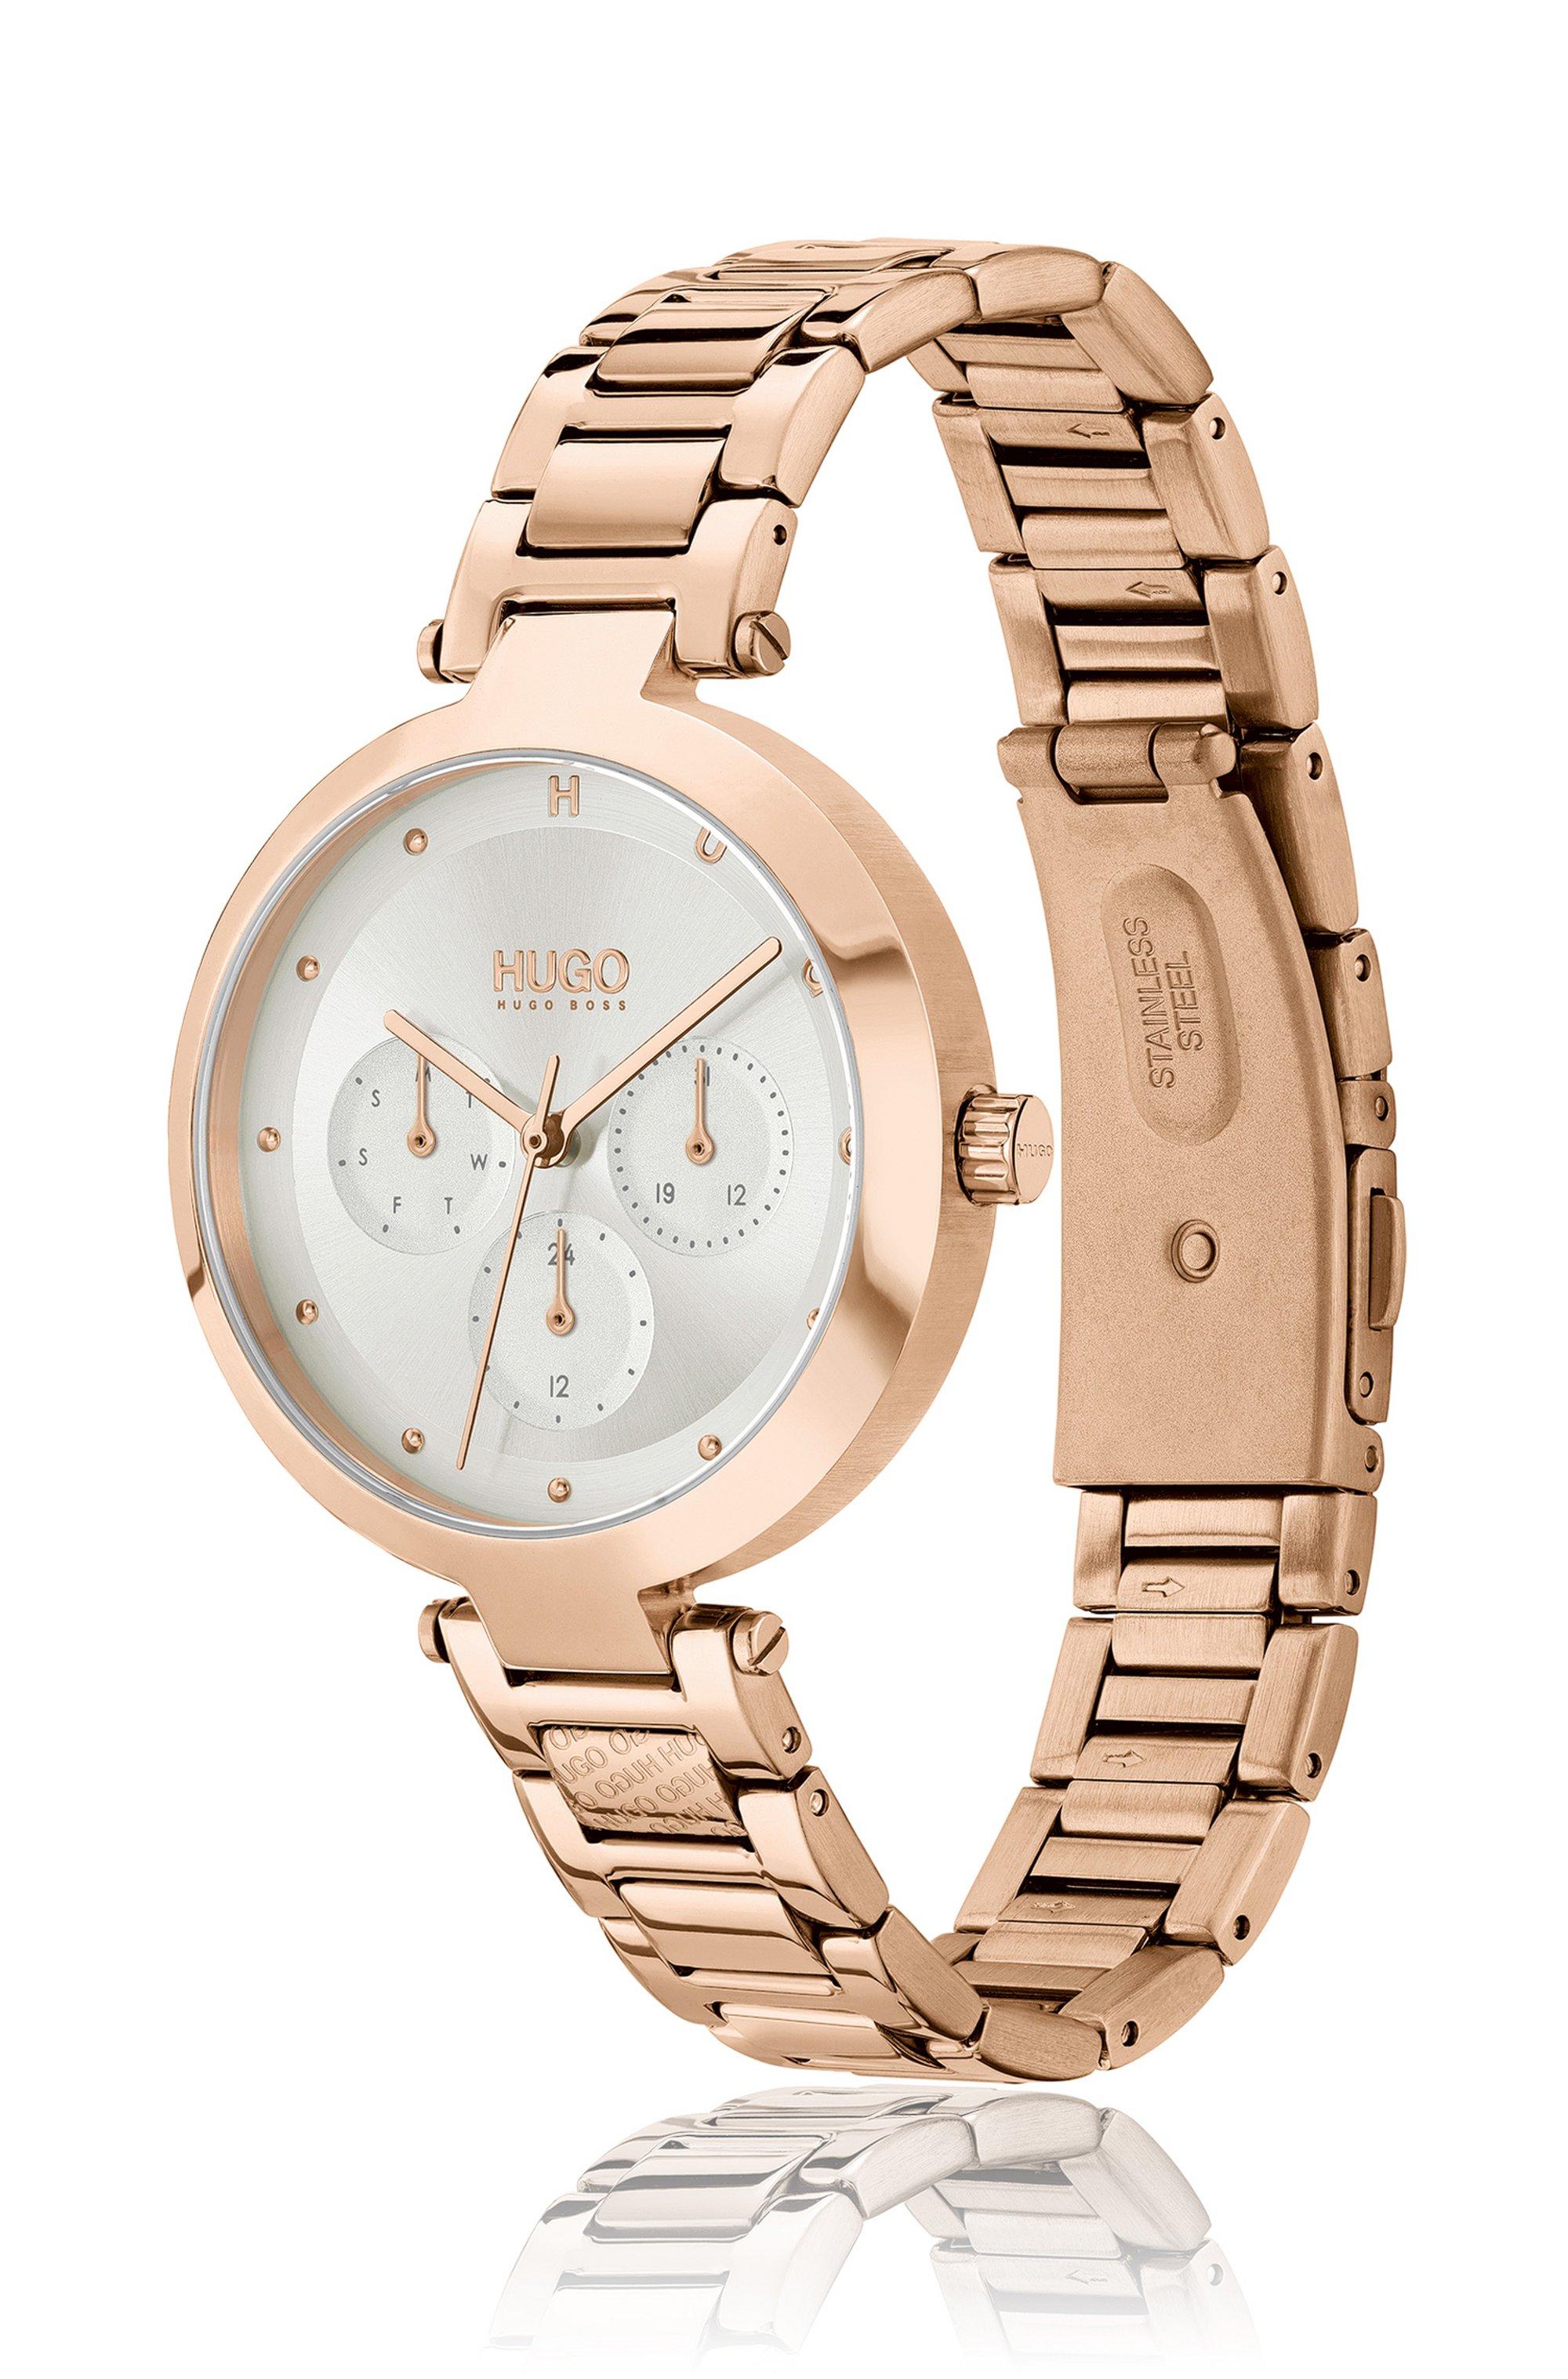 Carnation-gold-effect watch with branded H-link bracelet